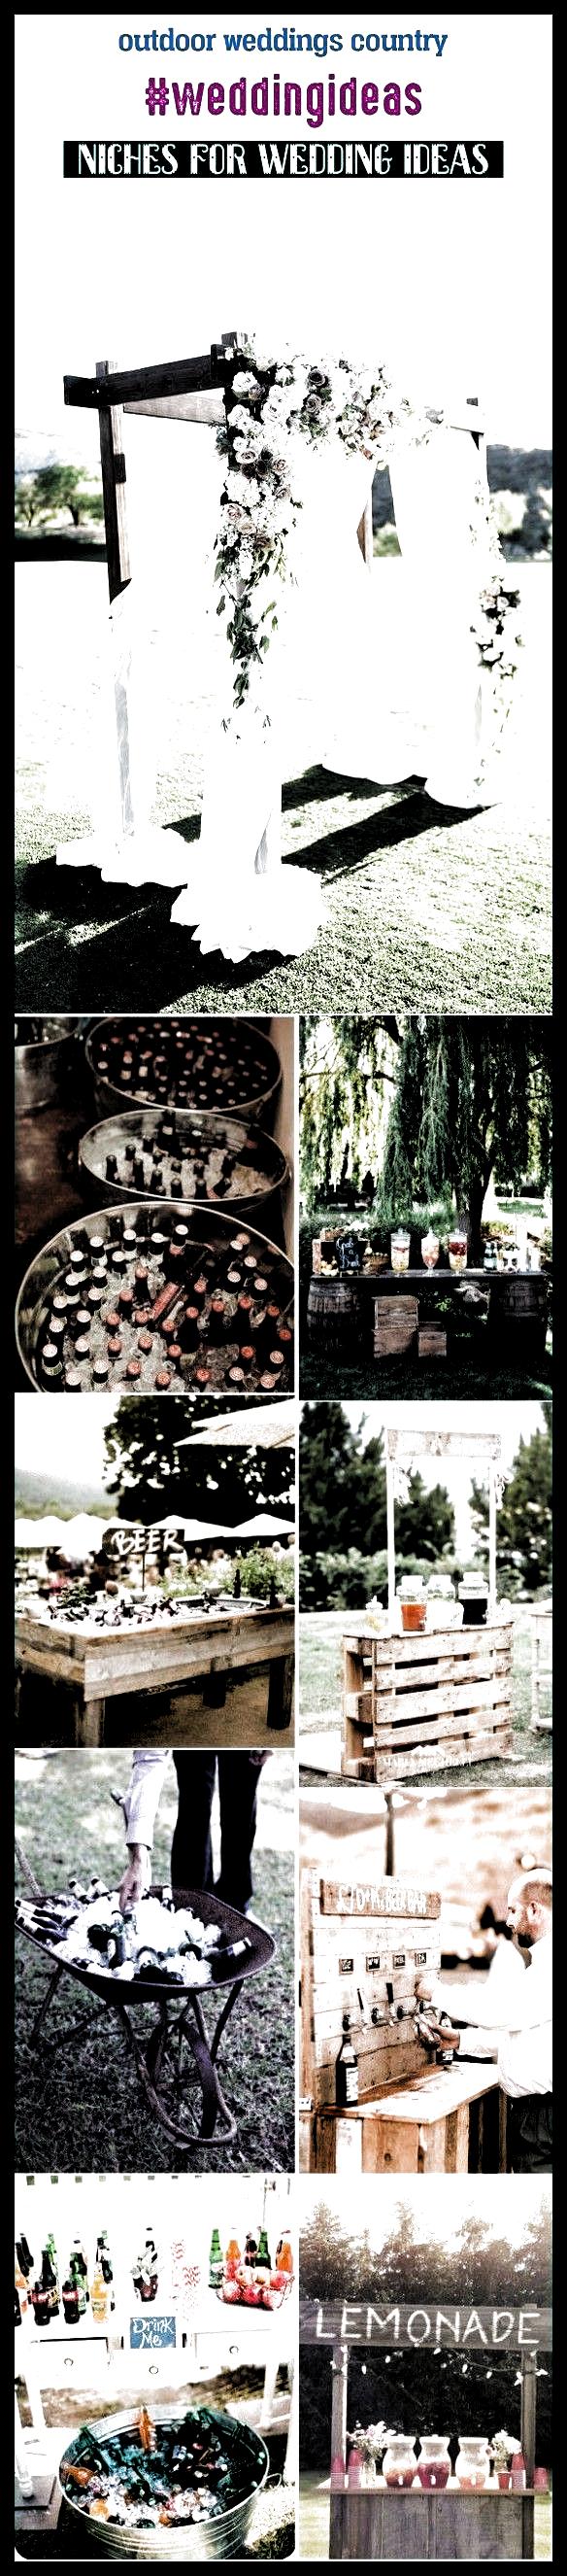 Outdoor weddings country . outdoor weddings - Outdoor weddings country . outdoor weddings ceremony, outdoor